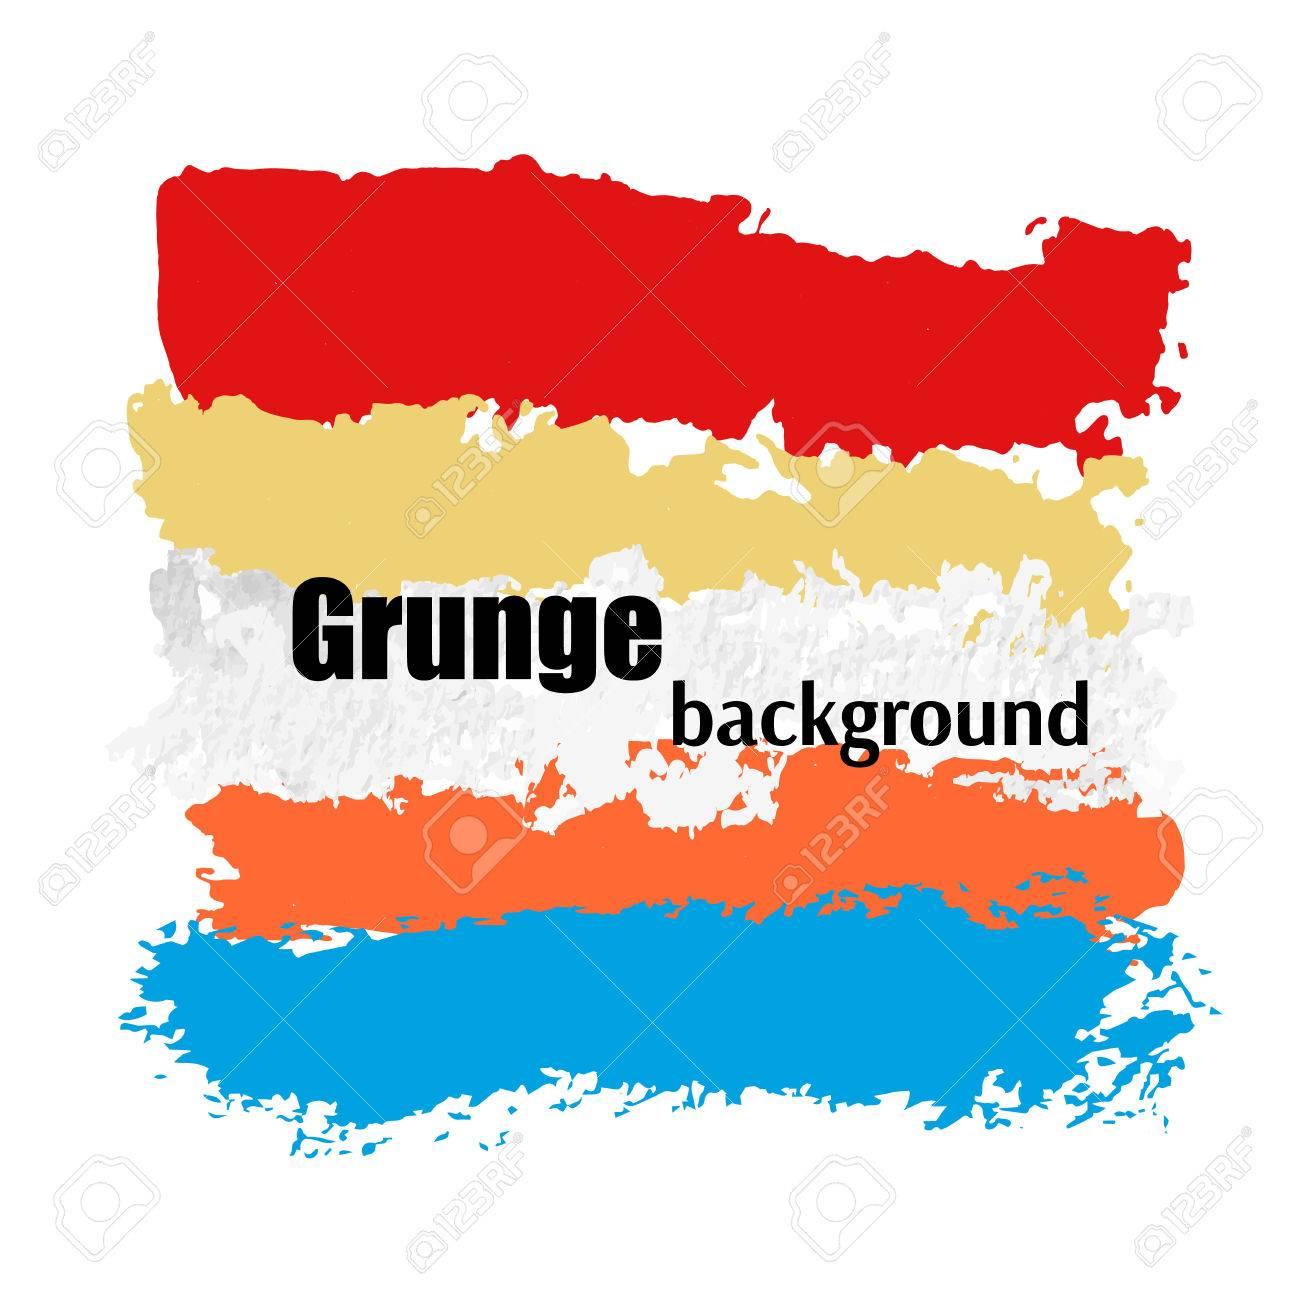 grunge vector banner splach abstract art background royalty free rh 123rf com vector grunge texture background grunge background vector template